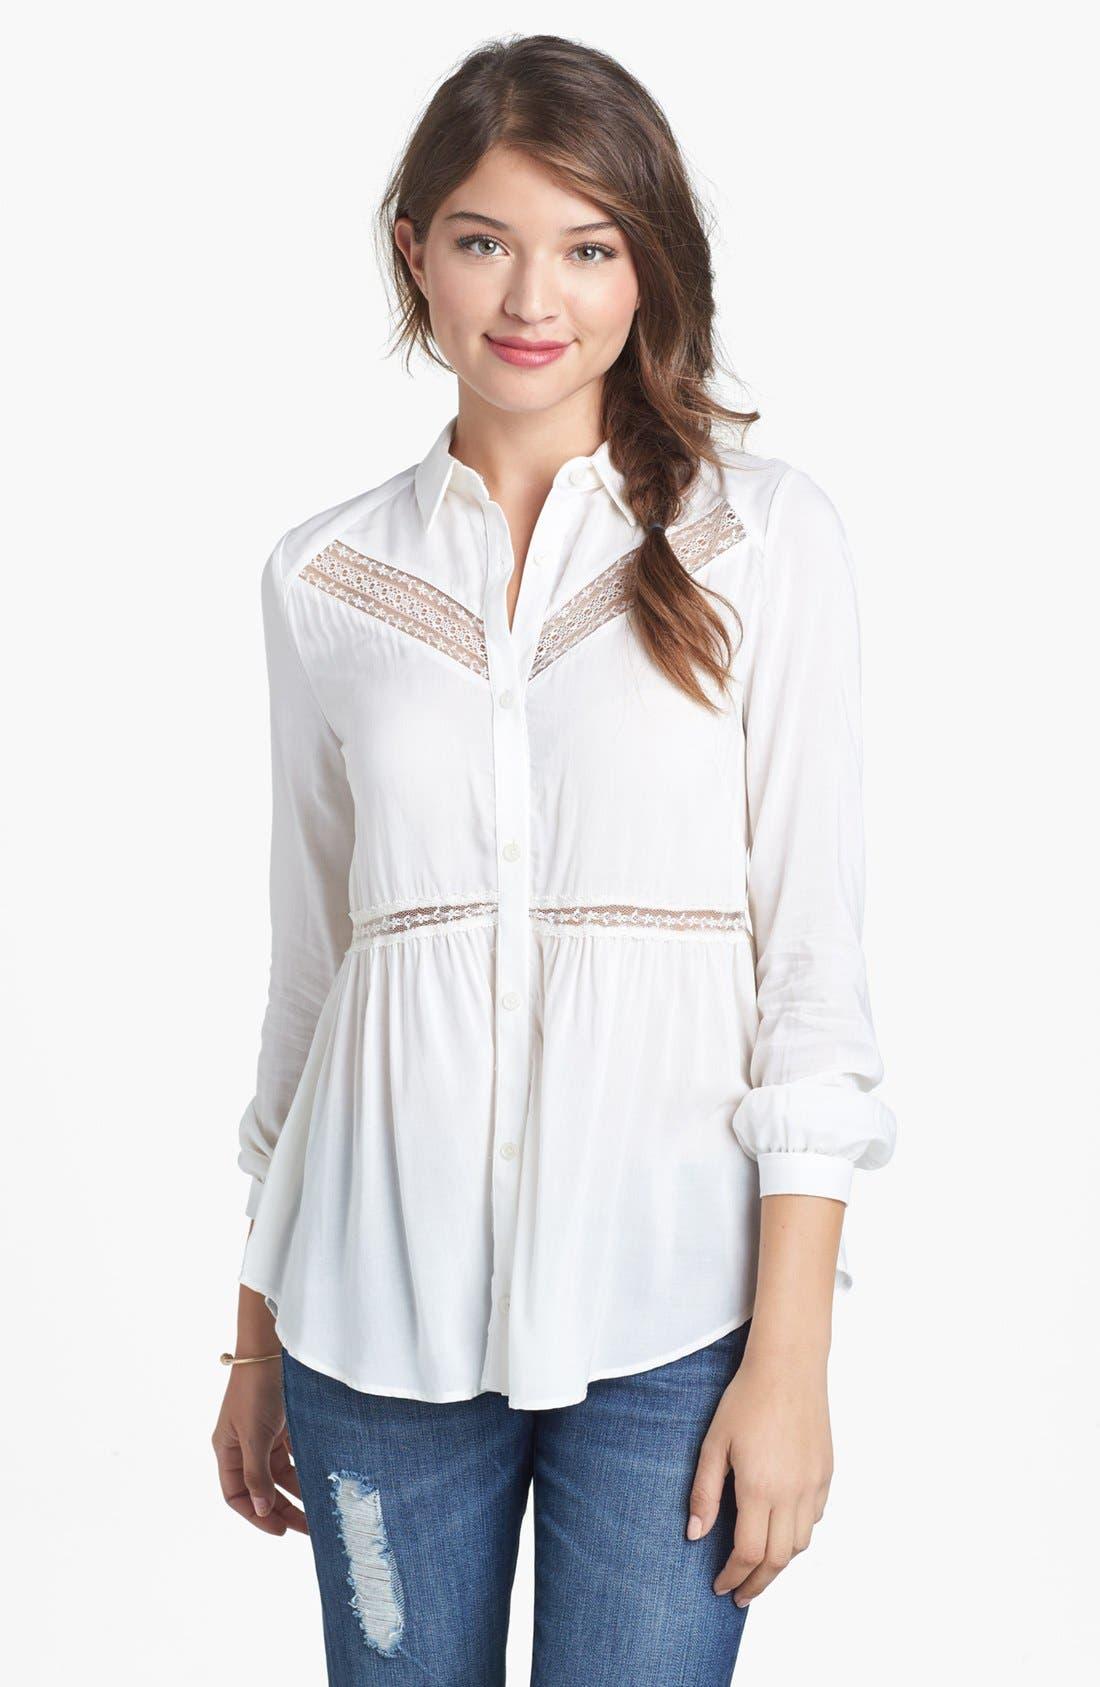 Alternate Image 1 Selected - Lush Lace Trim Shirt (Juniors)